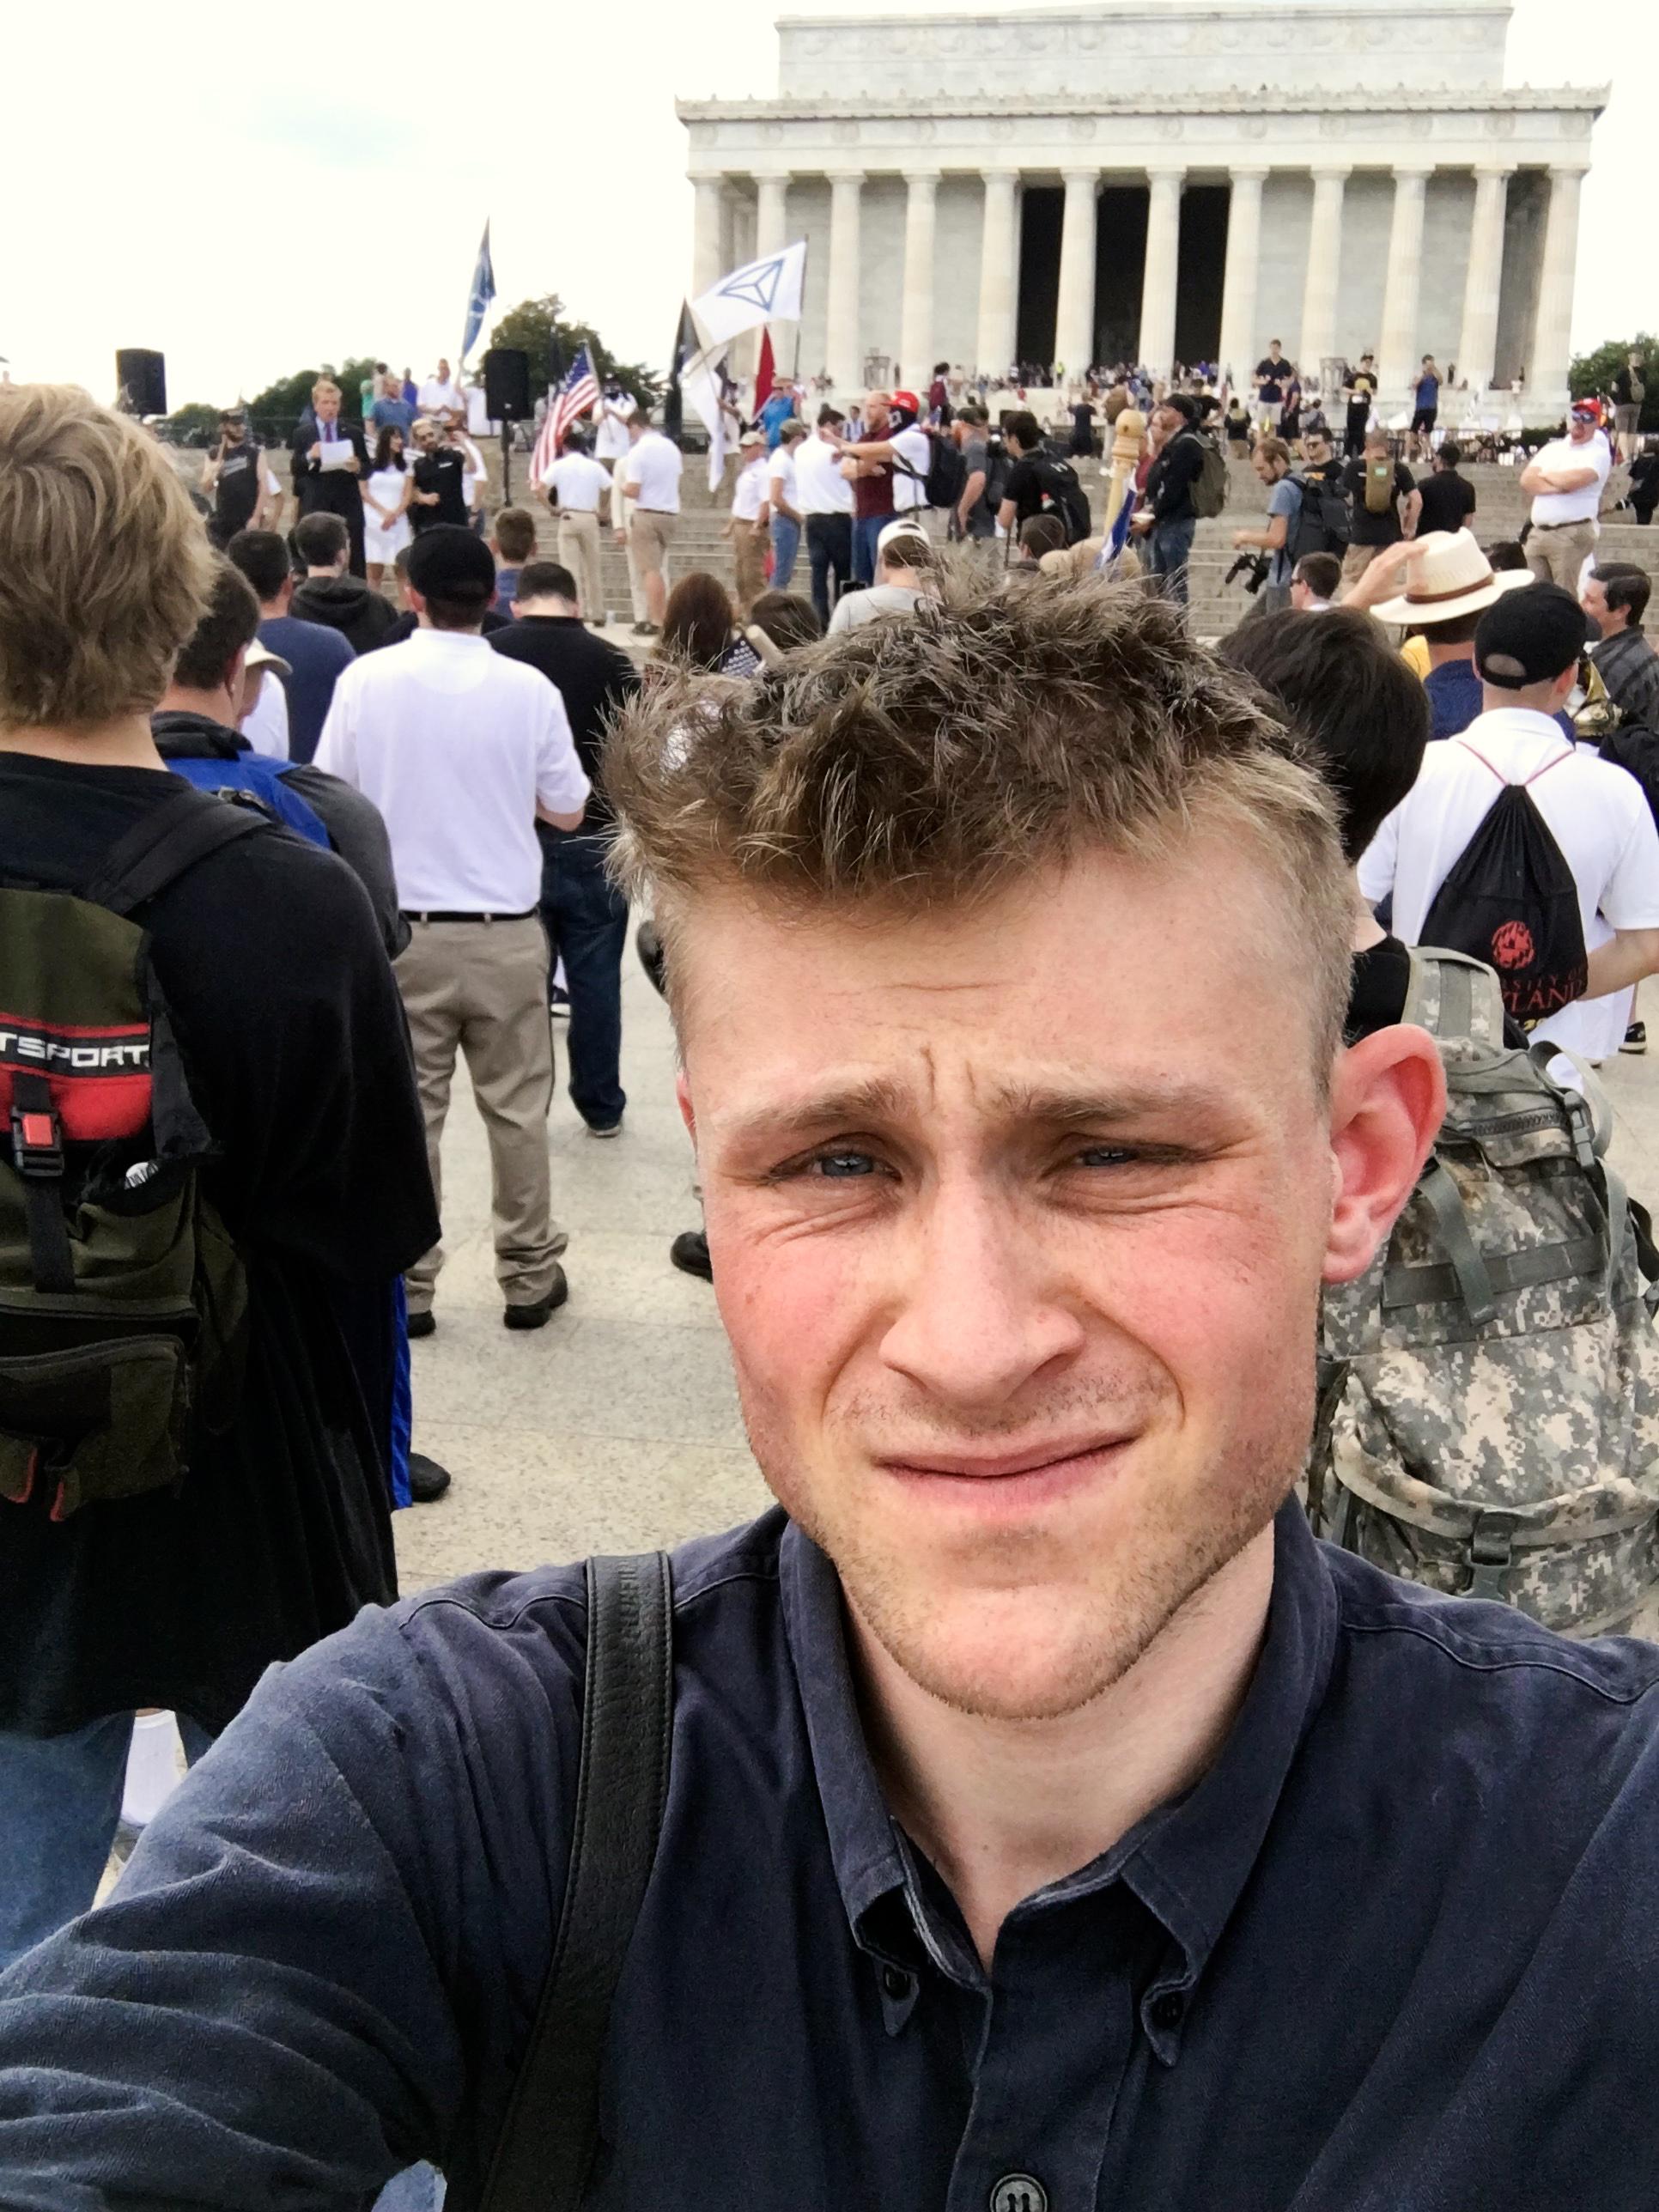 Patrik Hermansson tar en  selfie i anslutning till en högerextrem demonstration i USA.